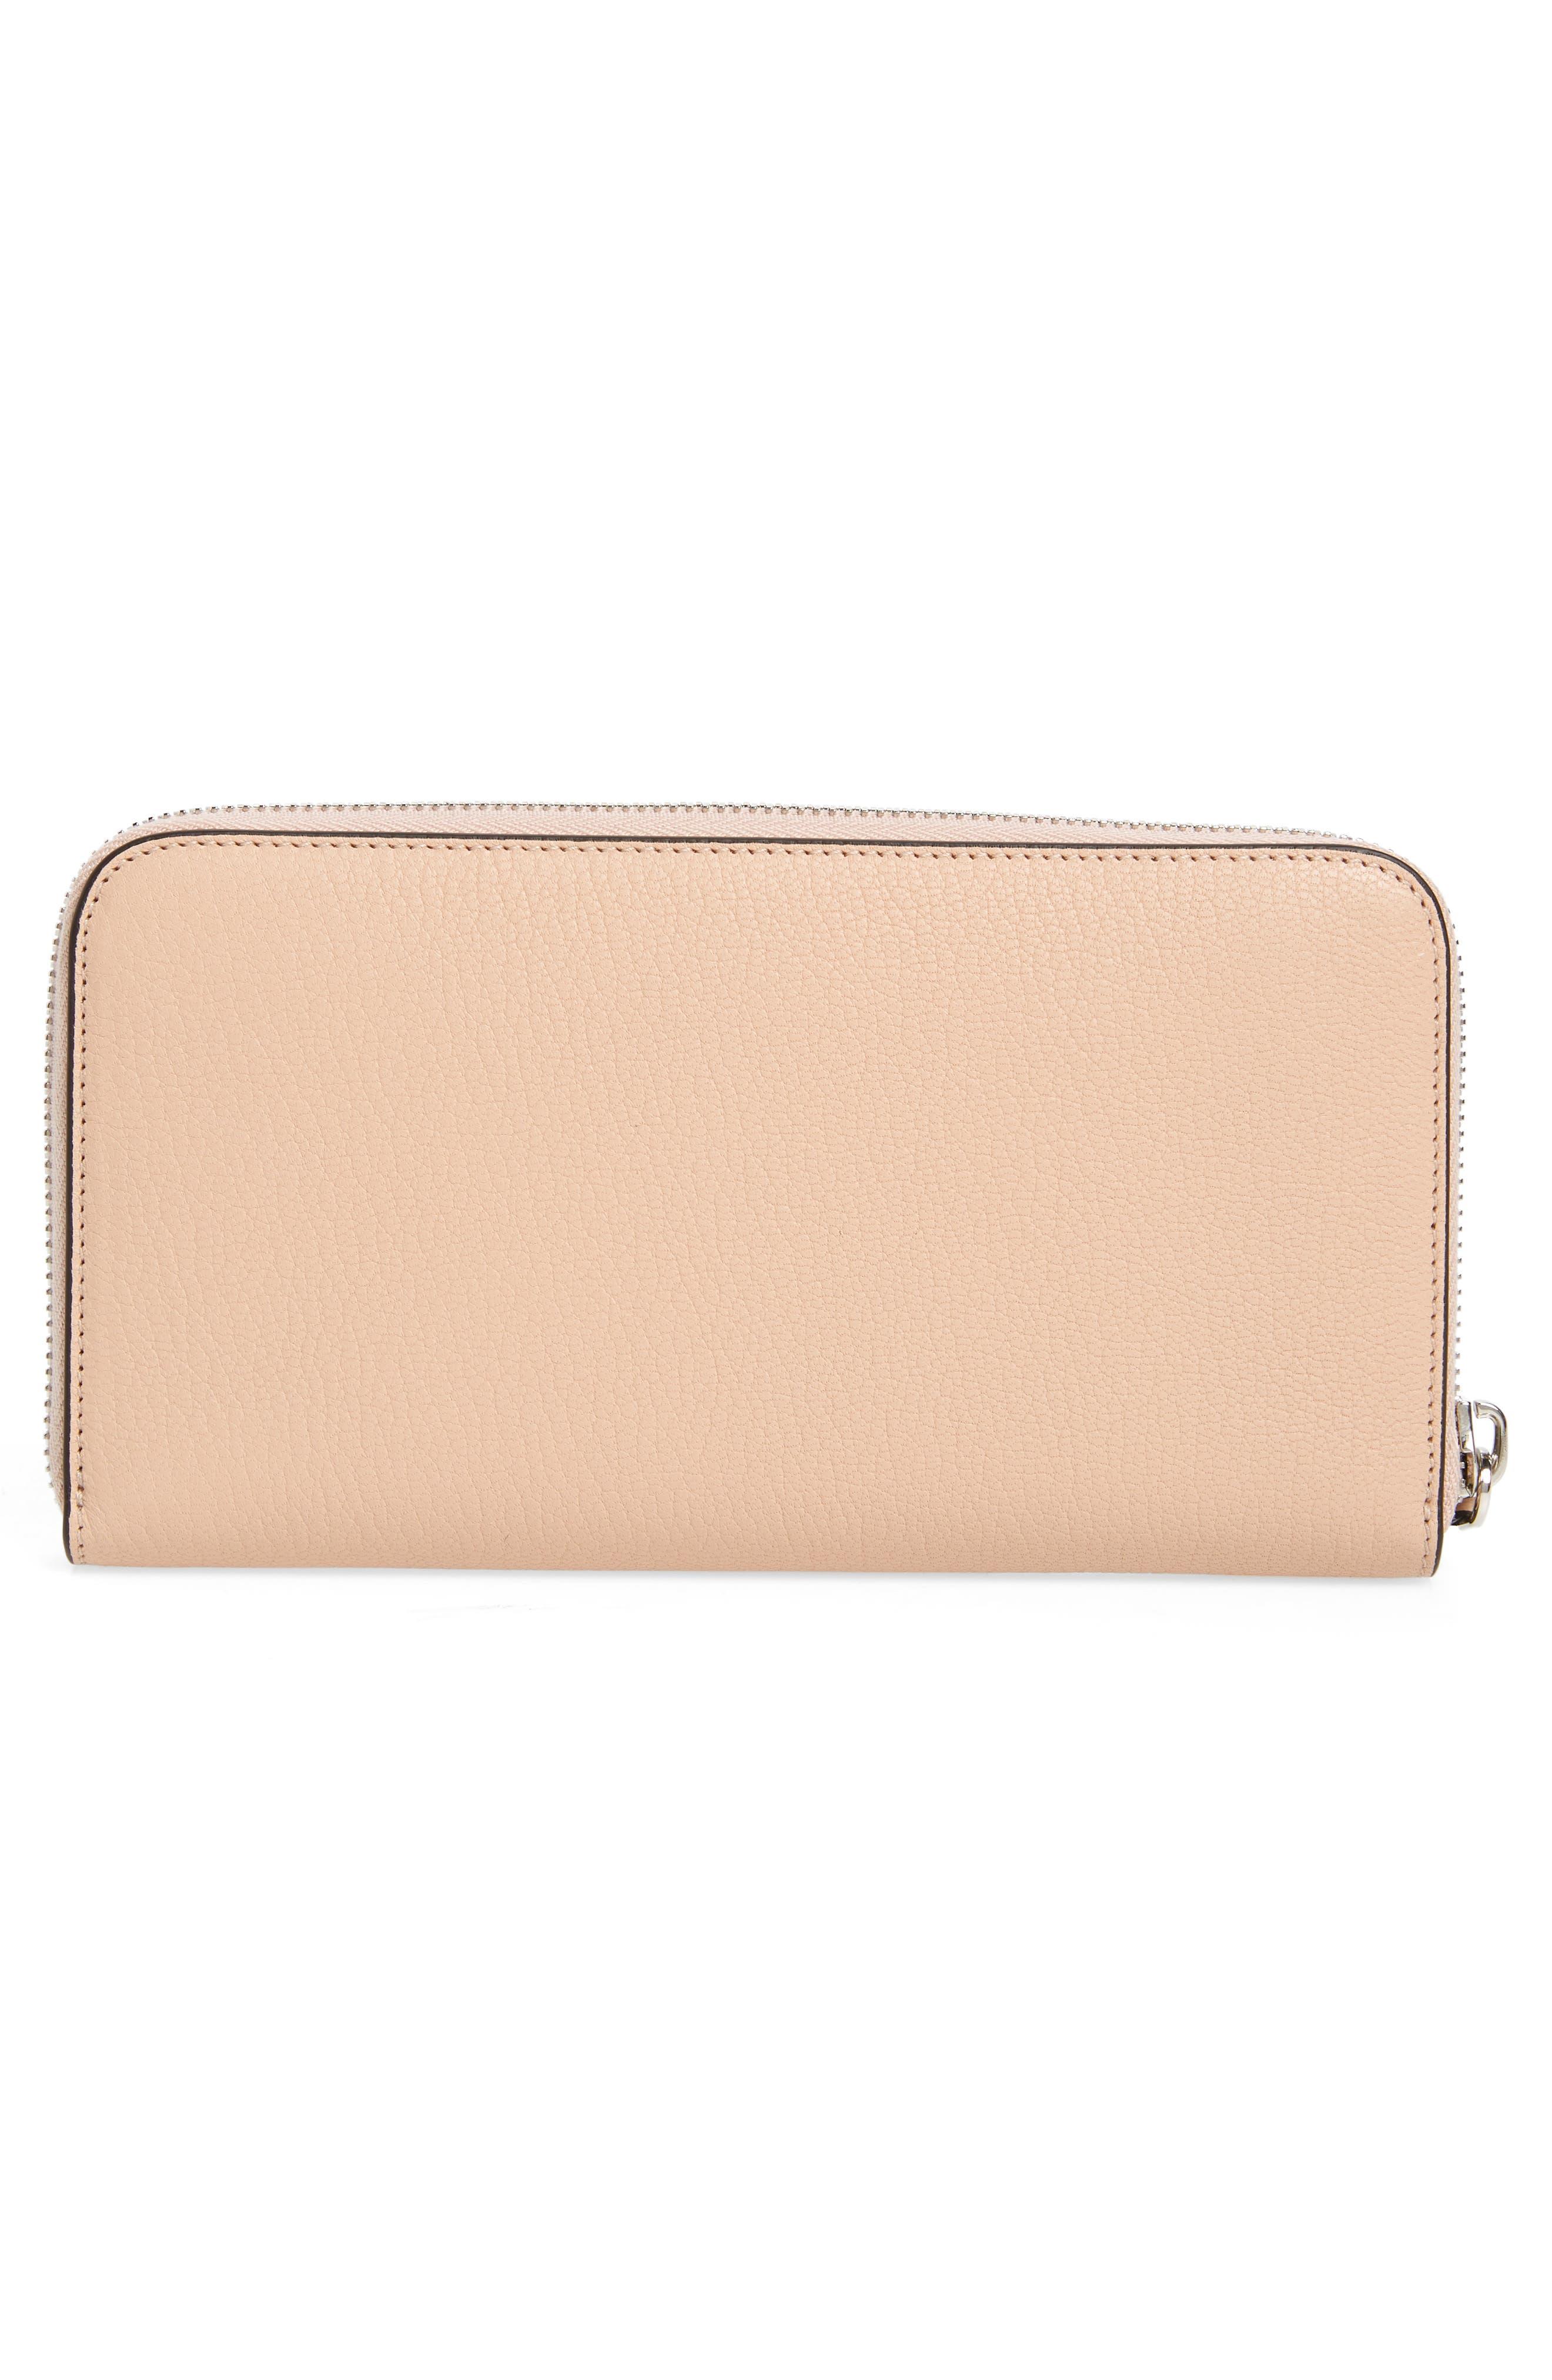 Padora Leather Zip Around Wallet,                             Alternate thumbnail 4, color,                             Powder